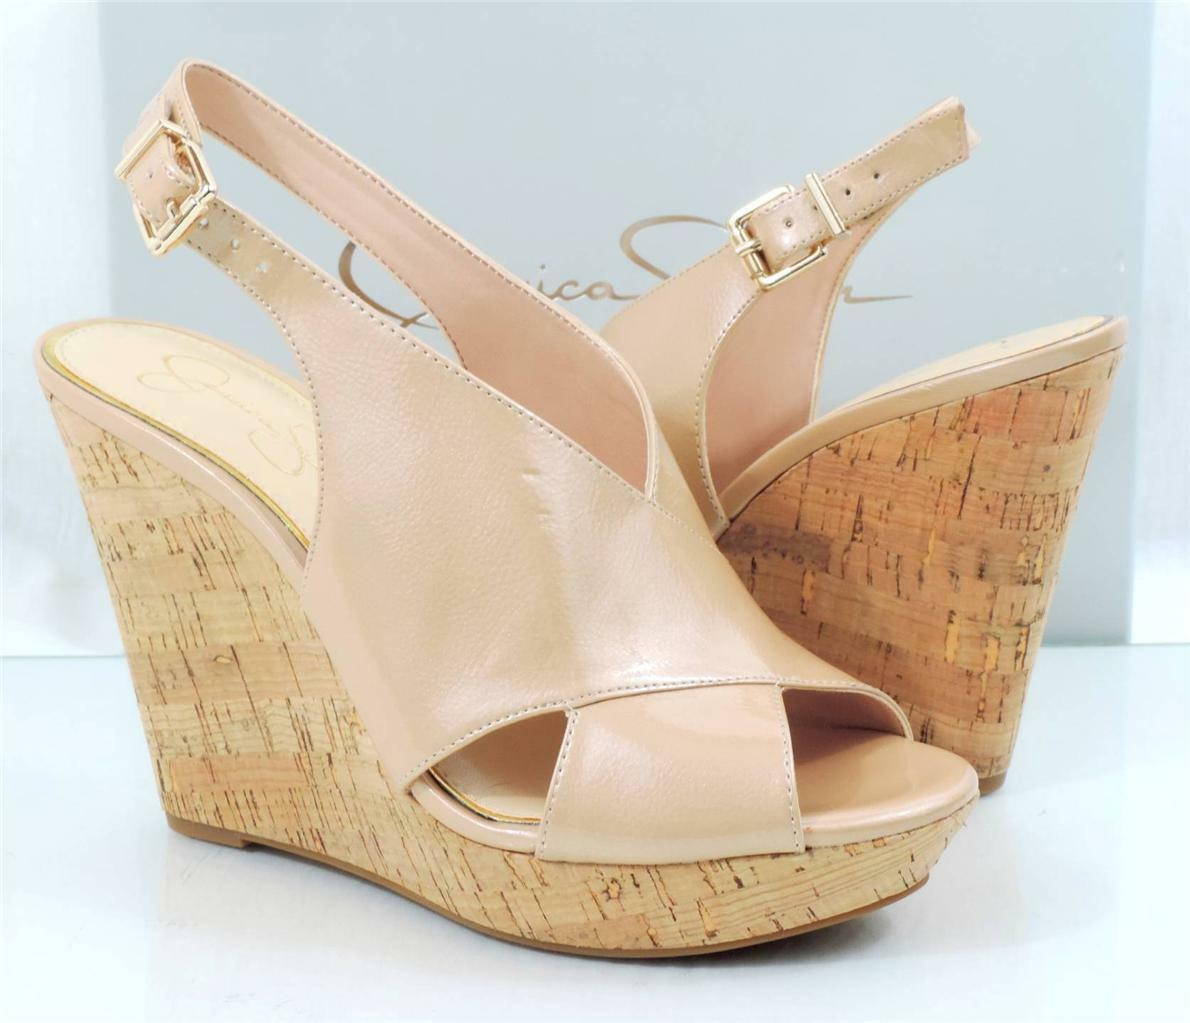 Jessica Simpson Colavita Platform Wedge Heels sandal Powder Nude Patent Size 9.5